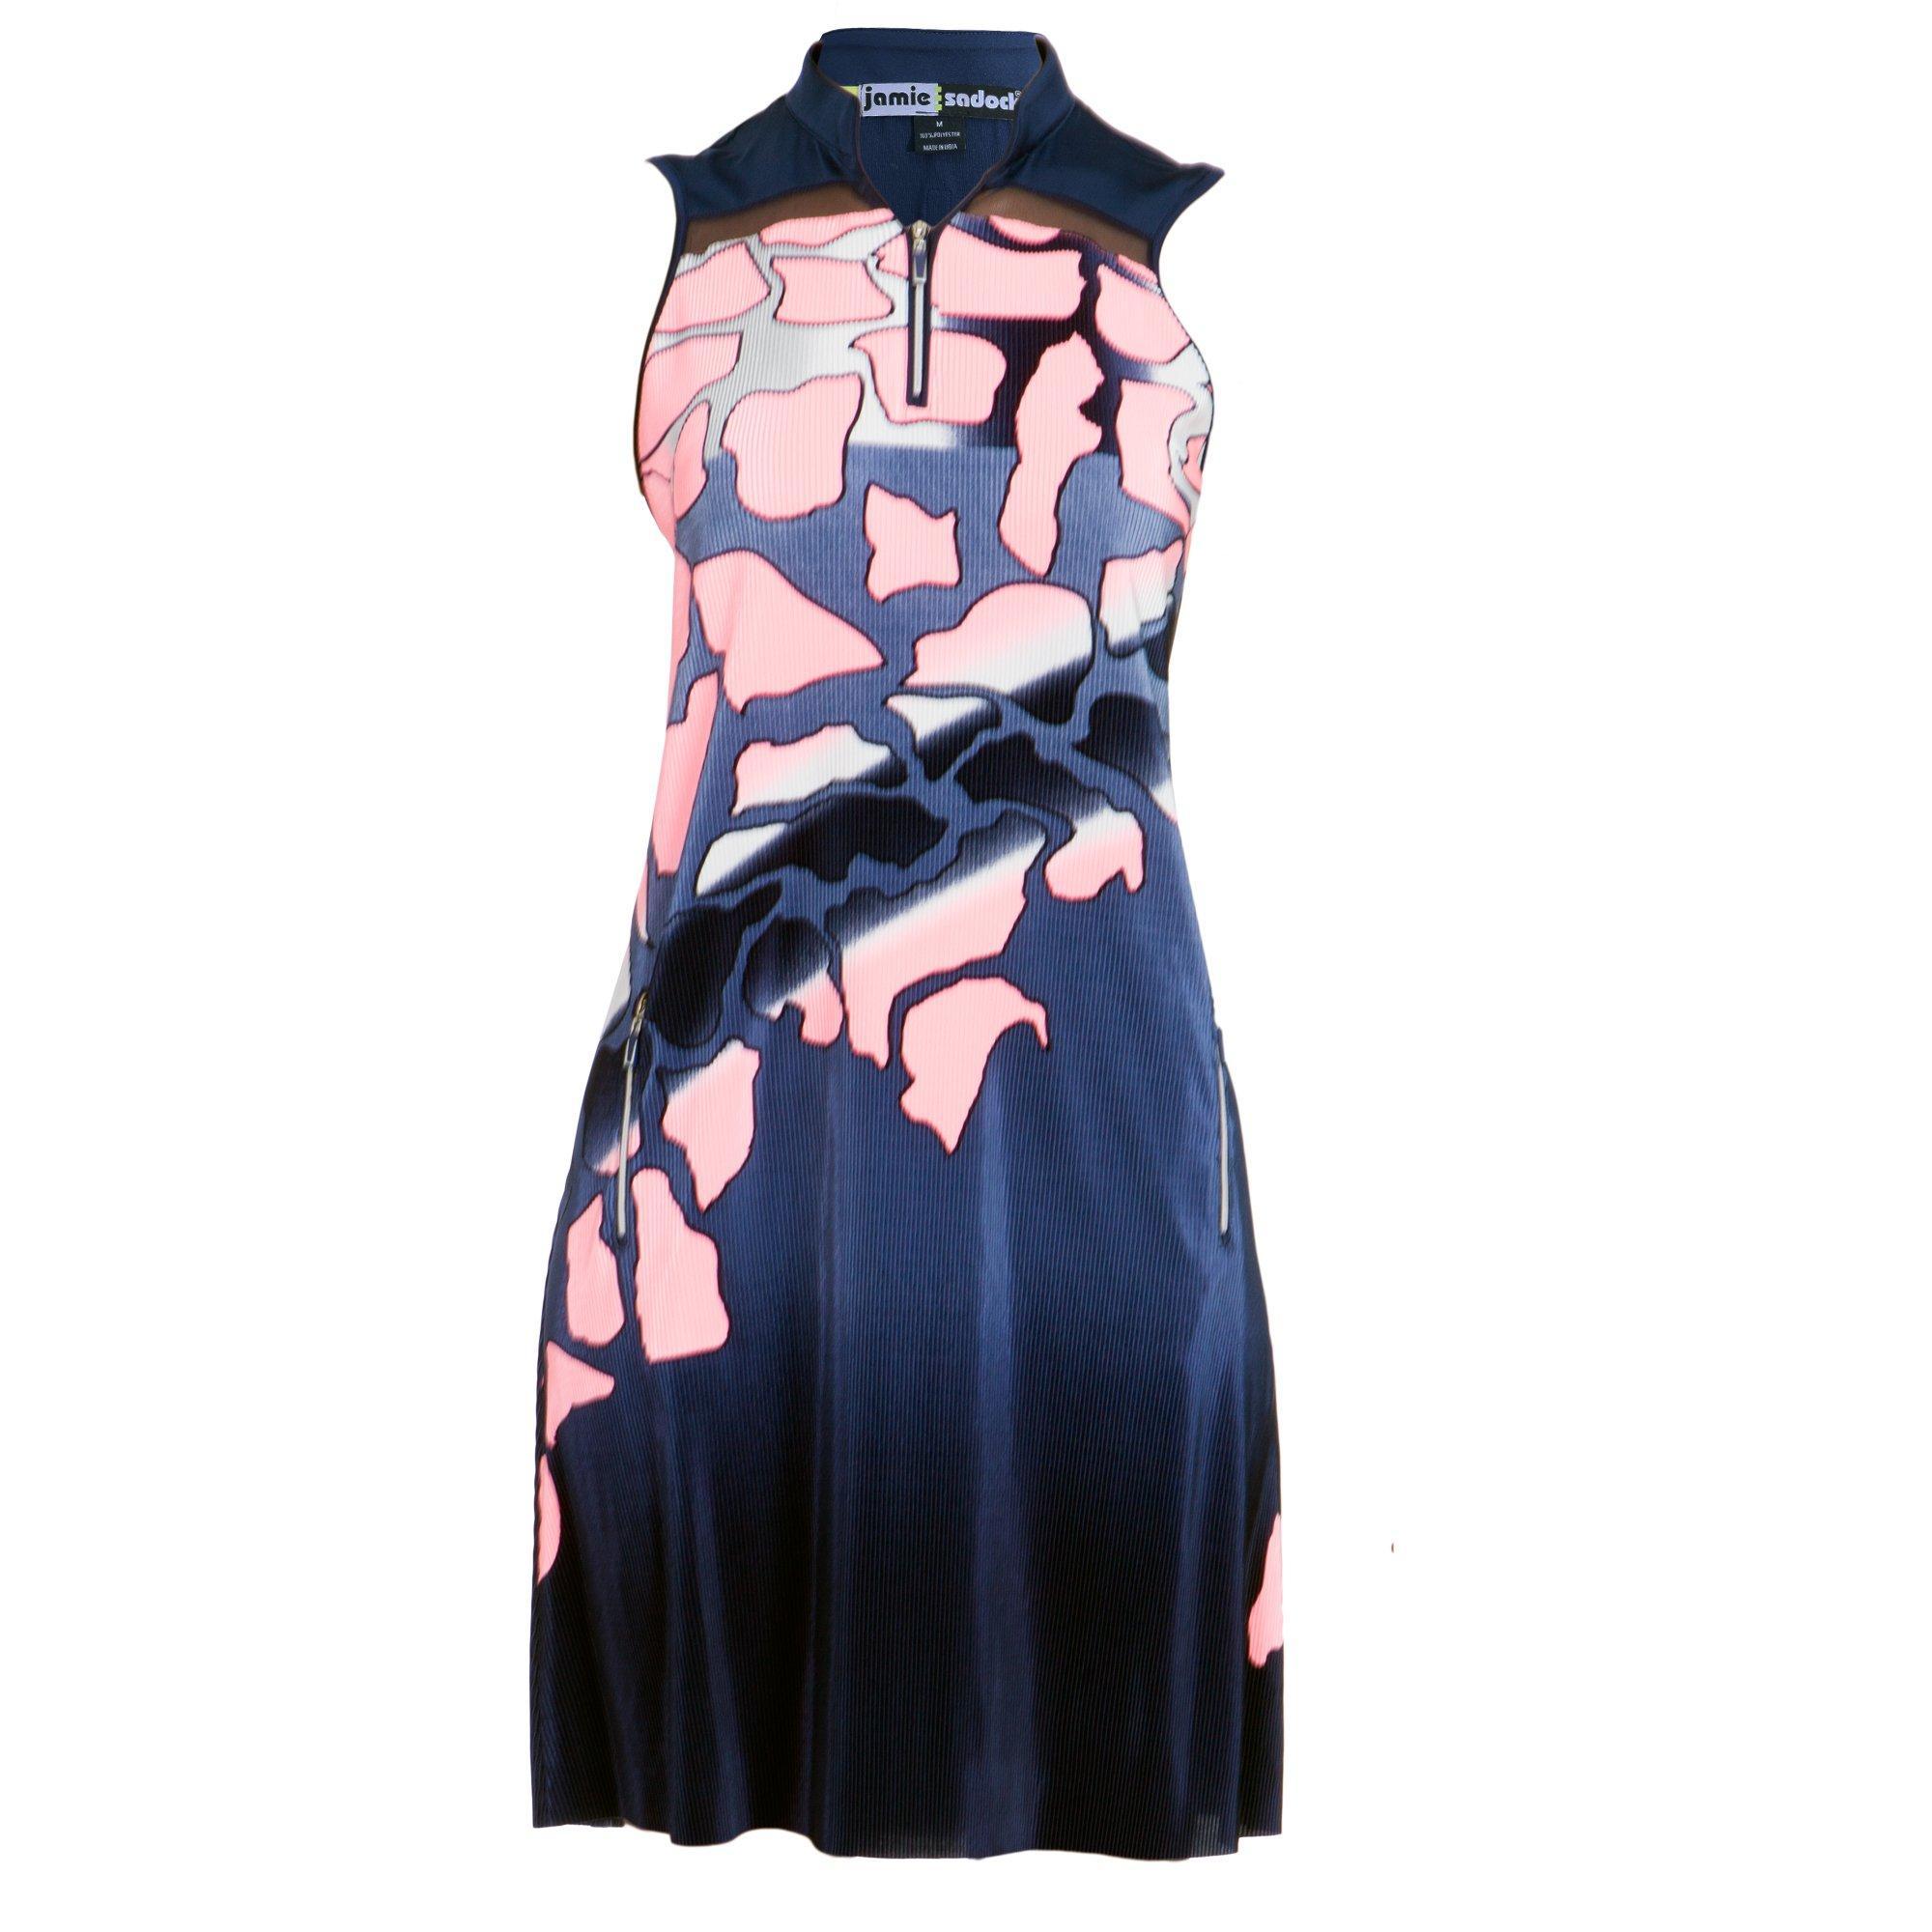 Women's Spring Camo Crunch Mock Neck Sleevless Dress